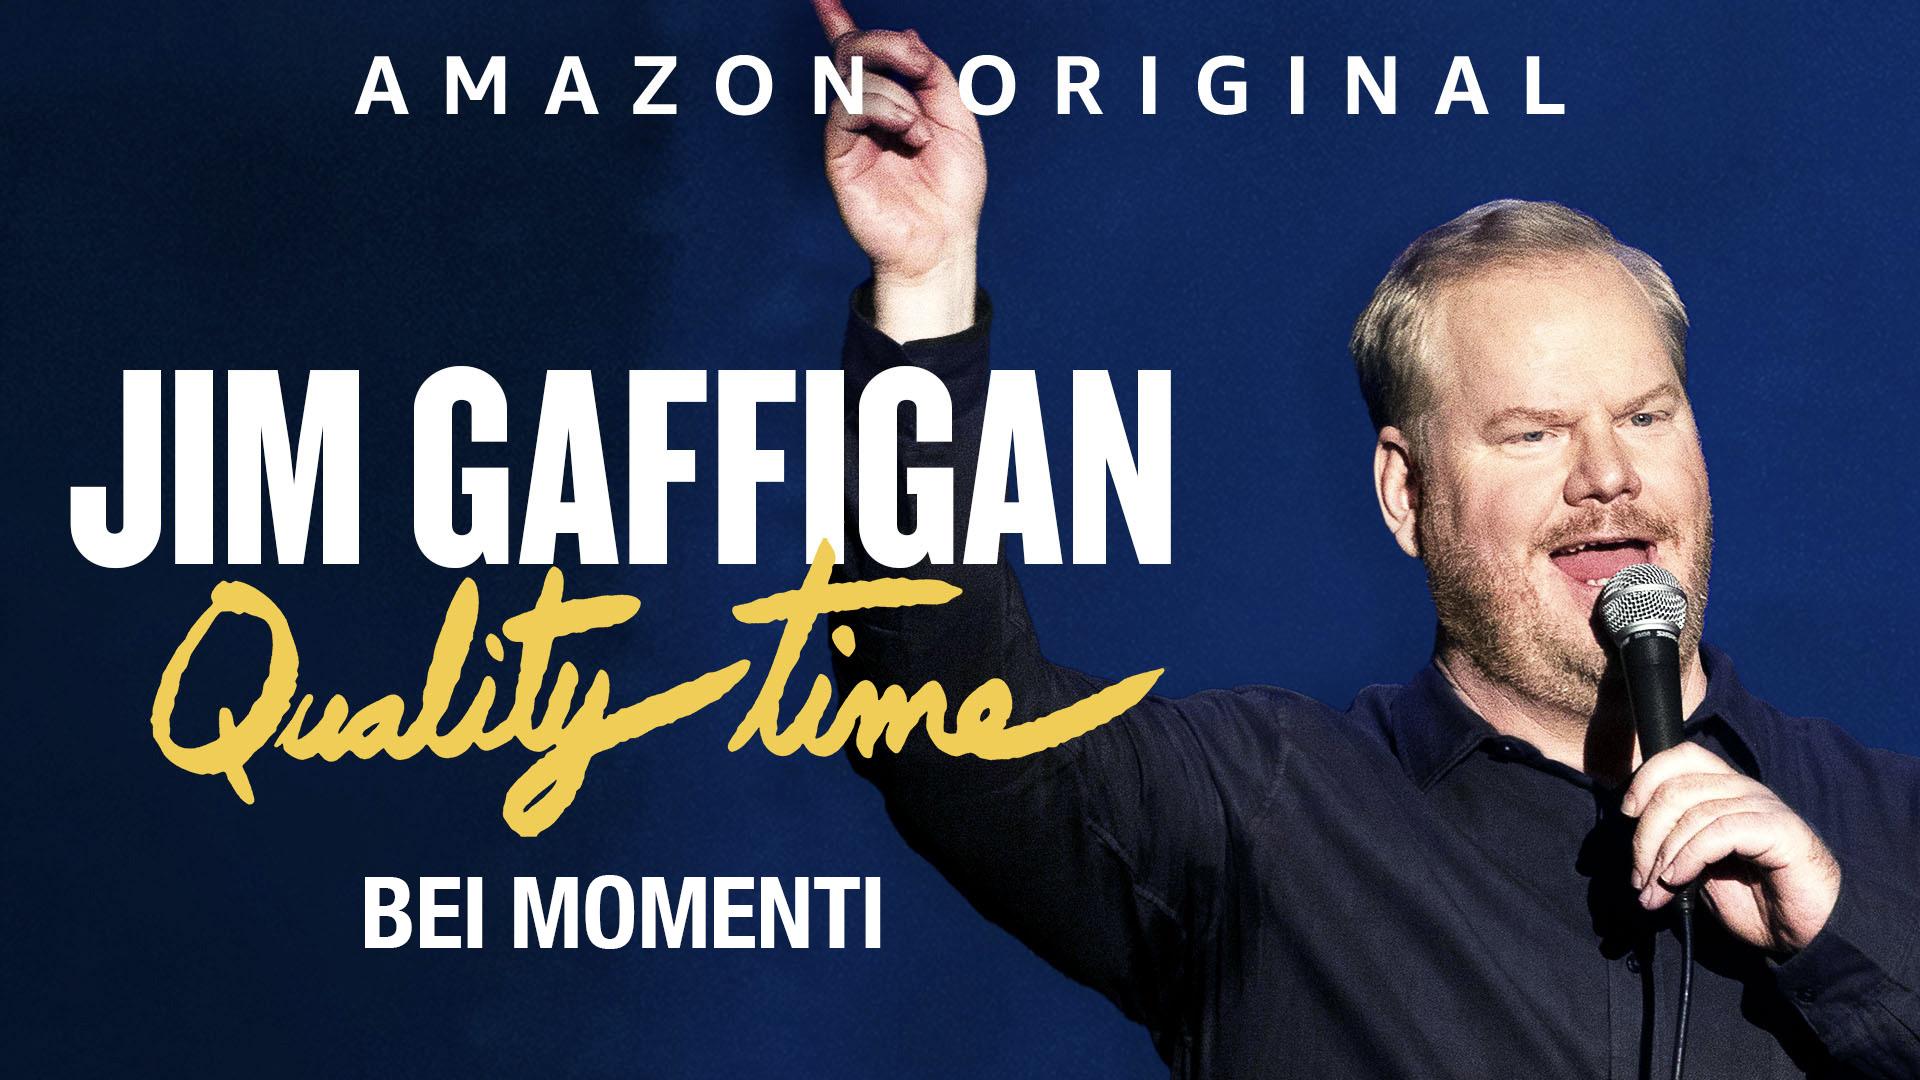 Jim Gaffigan: Bei momenti